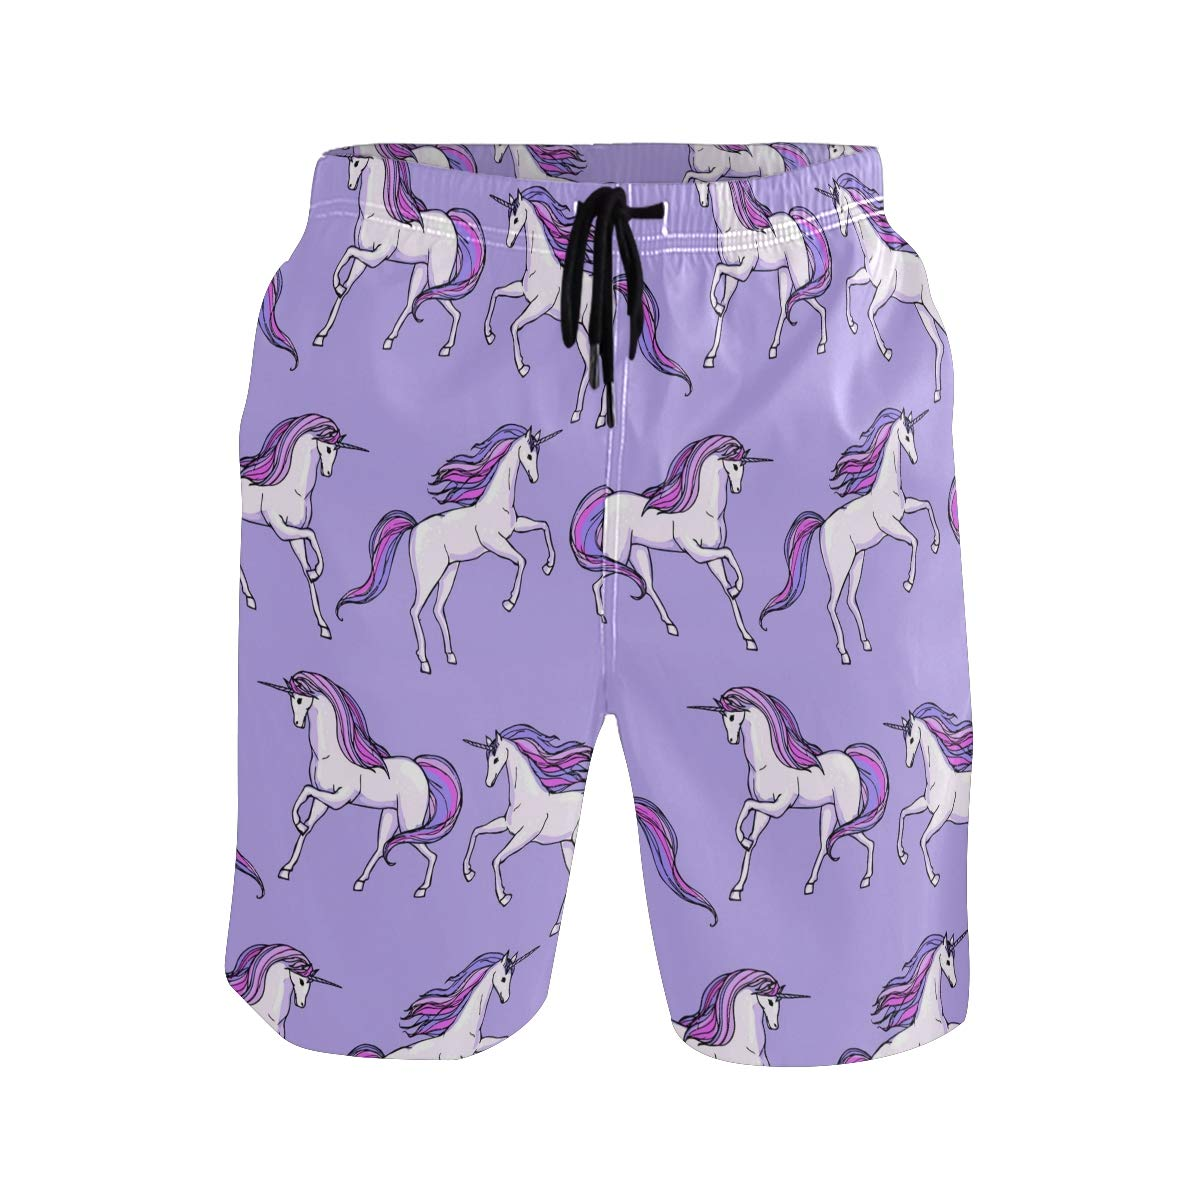 Mens Beach Swim Trunks Unicorn Horse Running Purple Boxer Swimsuit Underwear Board Shorts with Pocket